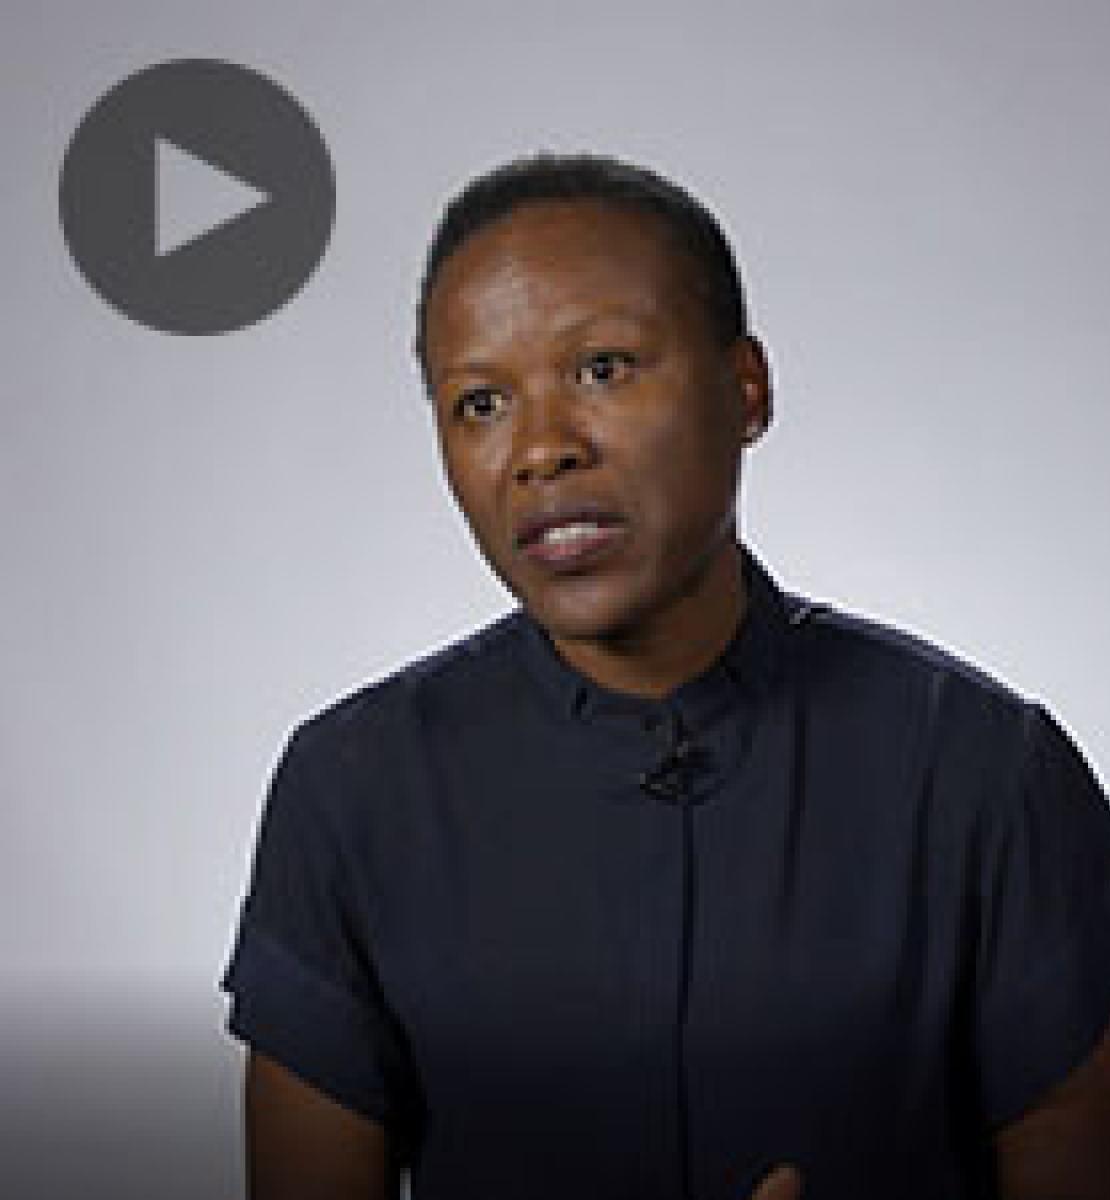 Screenshot from video message shows Resident Coordinator, Susan Namondo-Ngongi